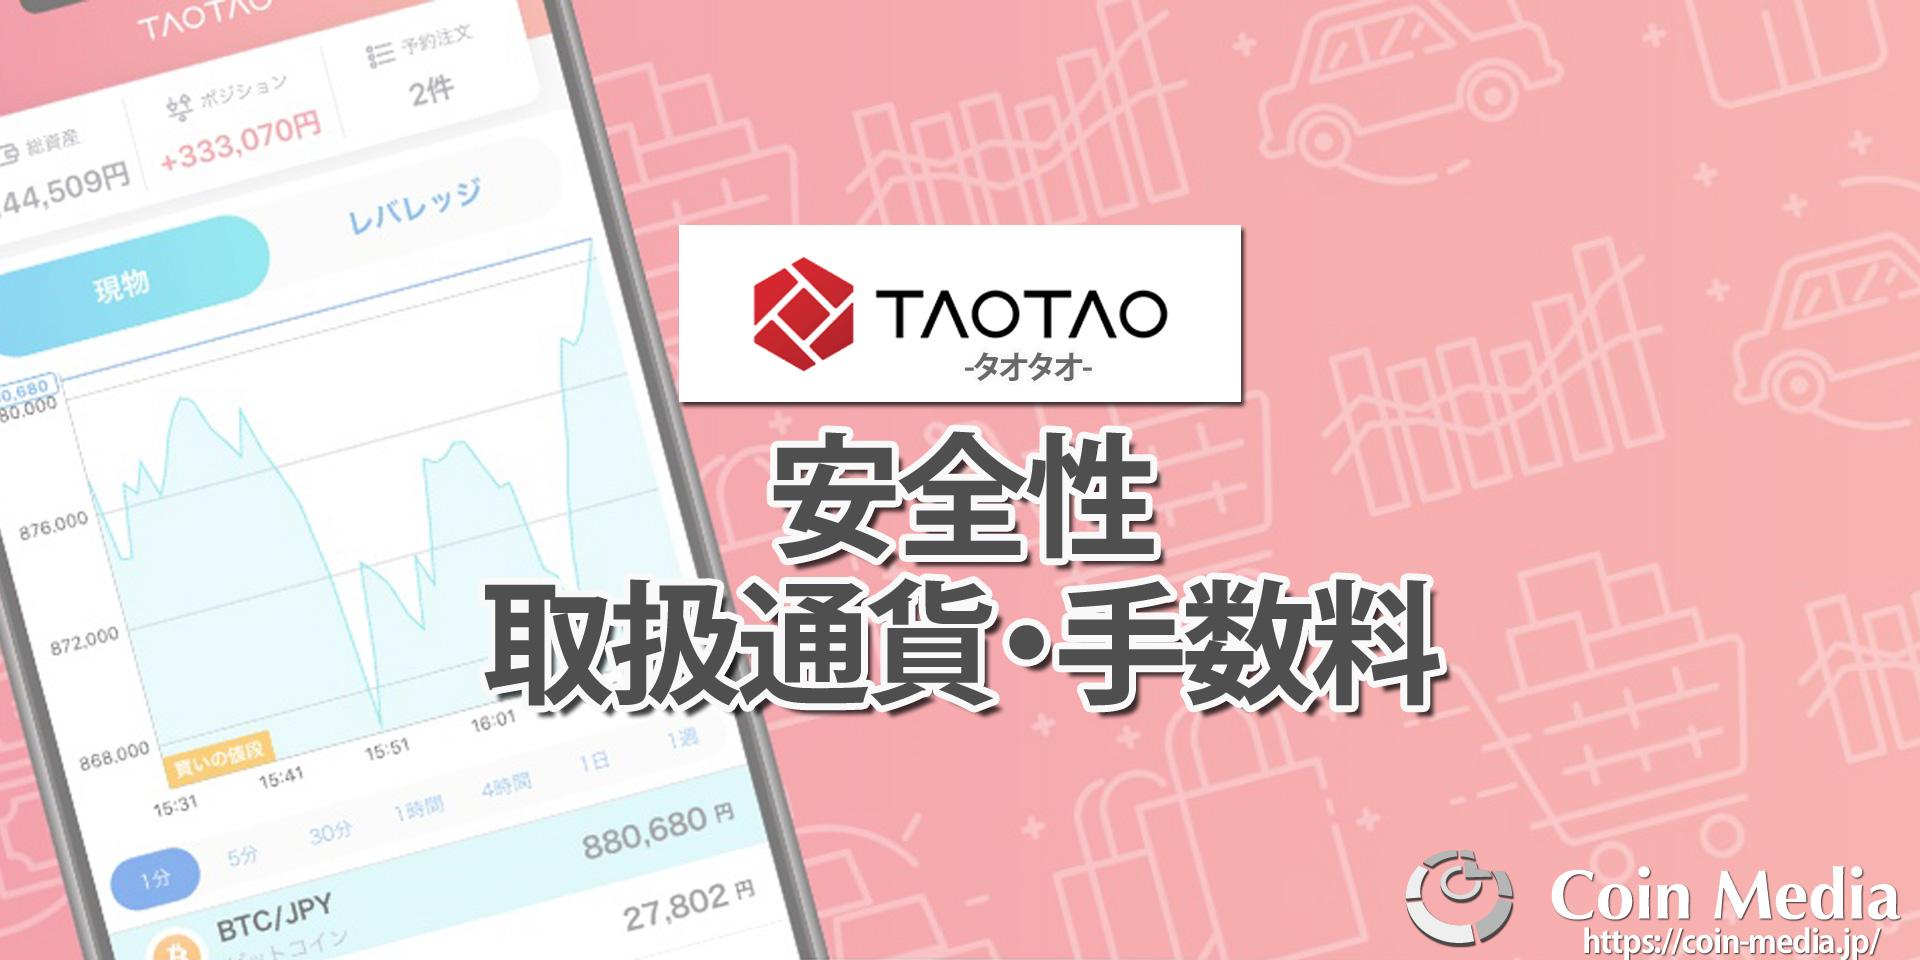 TAOTAO(タオタオ)とは?ヤフー関連会社の仮想通貨取引所について徹底解説!(取扱通貨/手数料)